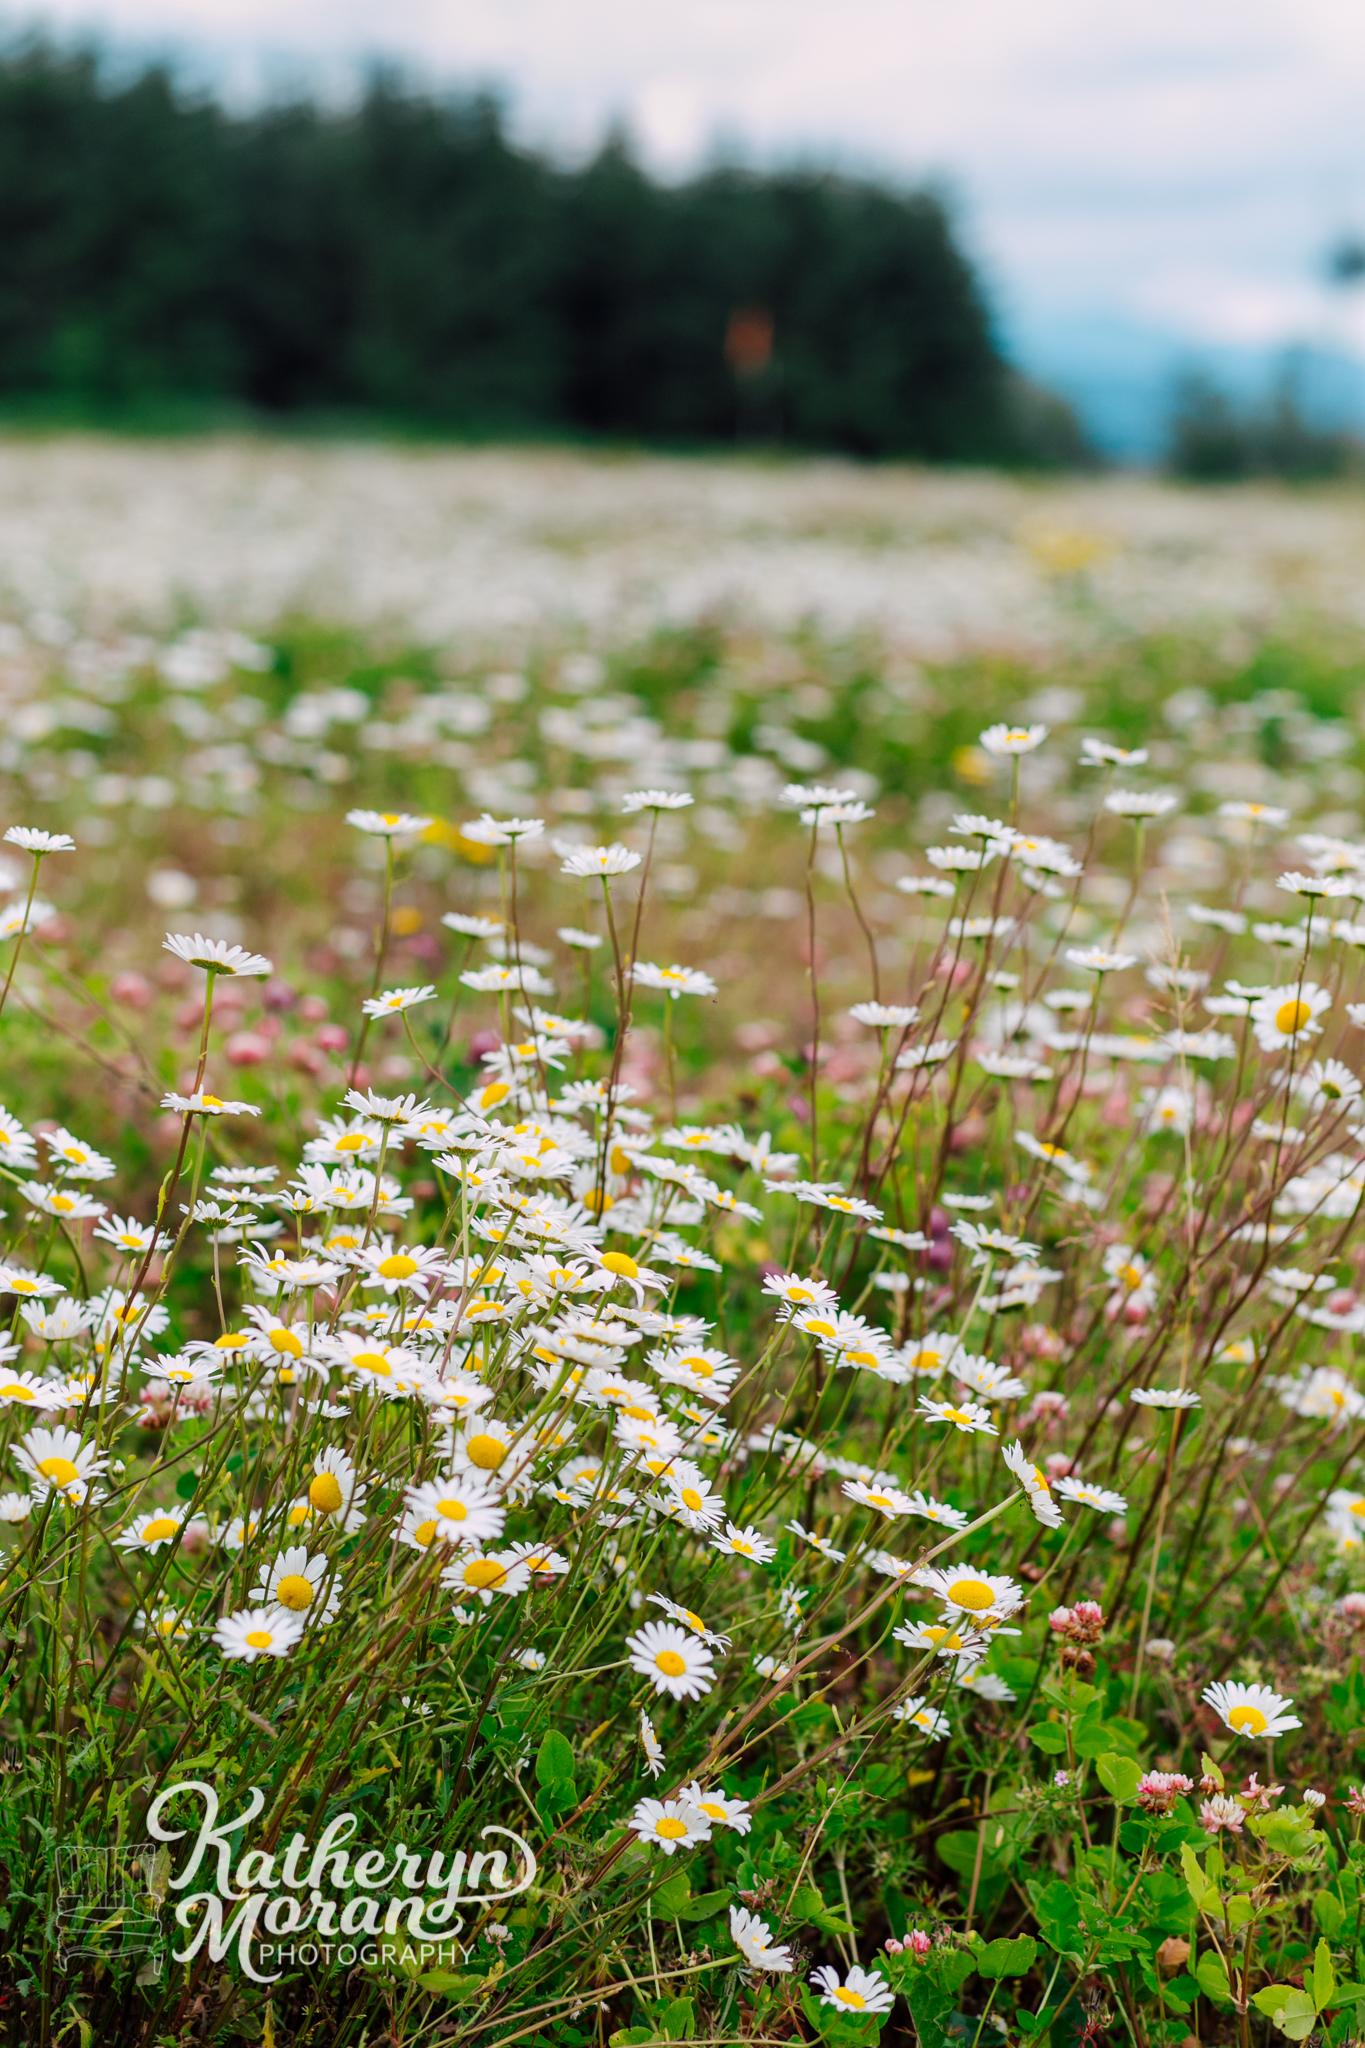 bellingham-marketing-photographer-katheryn-moran-alluvial-farms-spring-2018-8.jpg